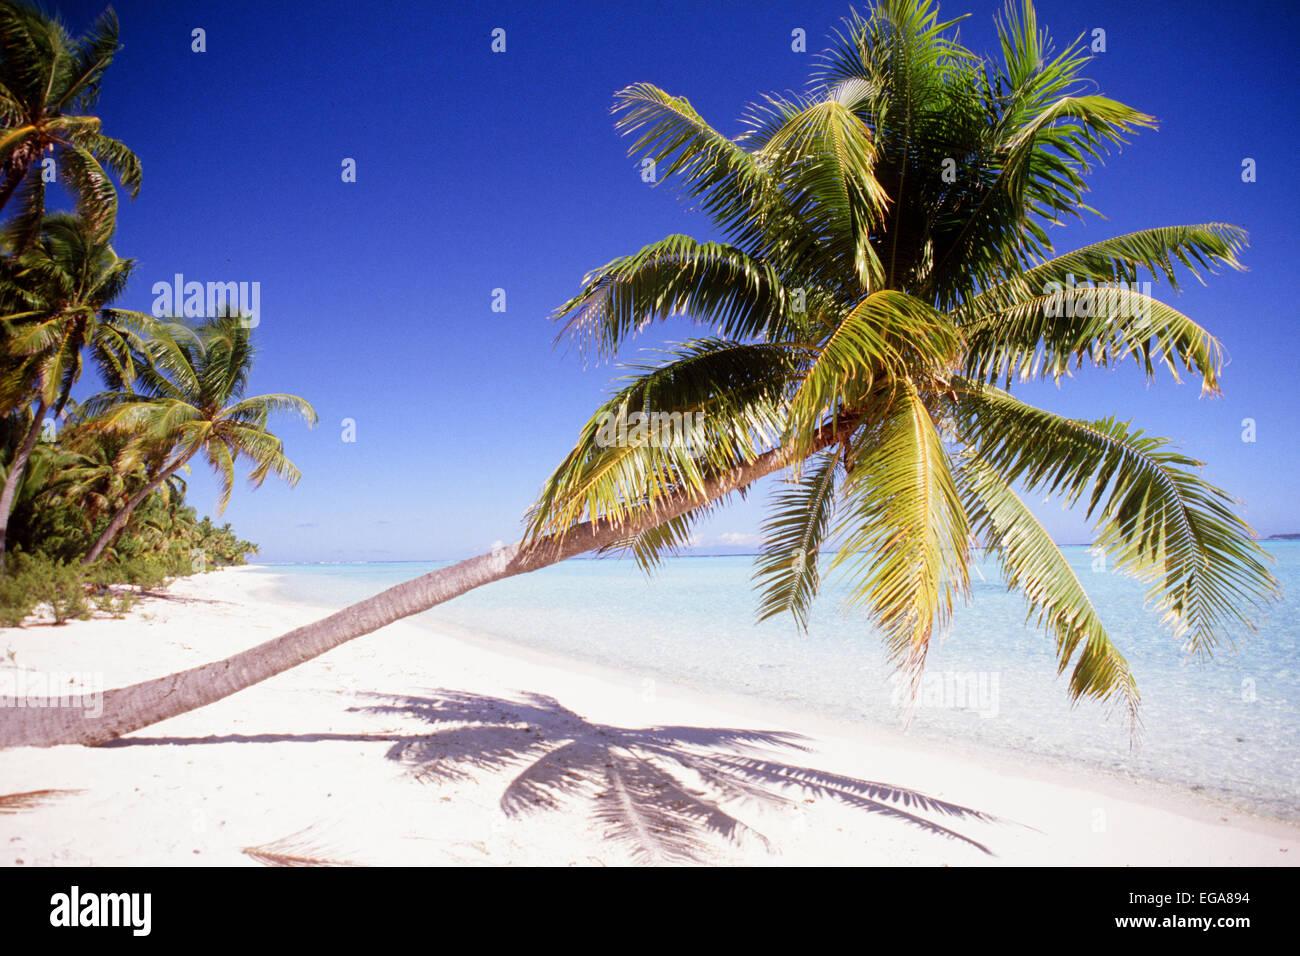 One Foot Island, Aitutaki, Cook Islands - Stock Image